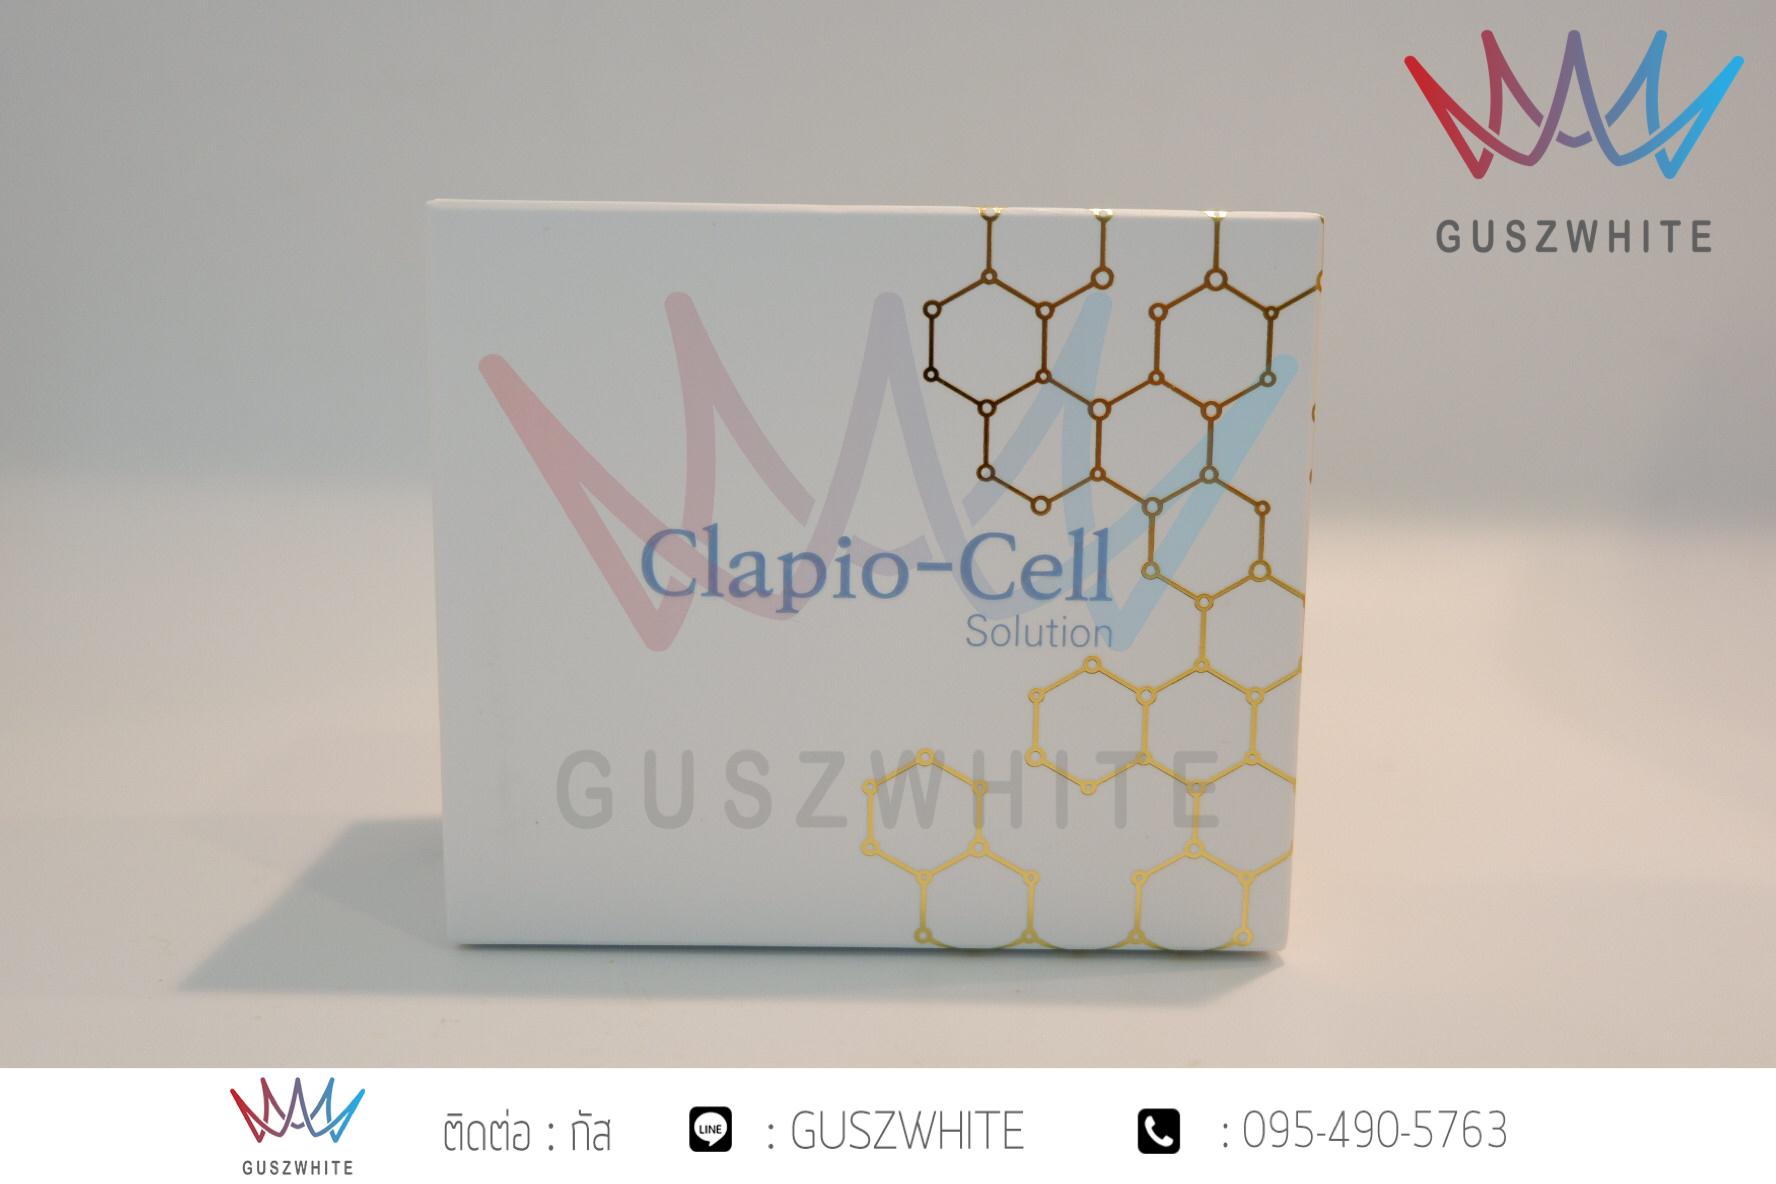 Clapio-Cell